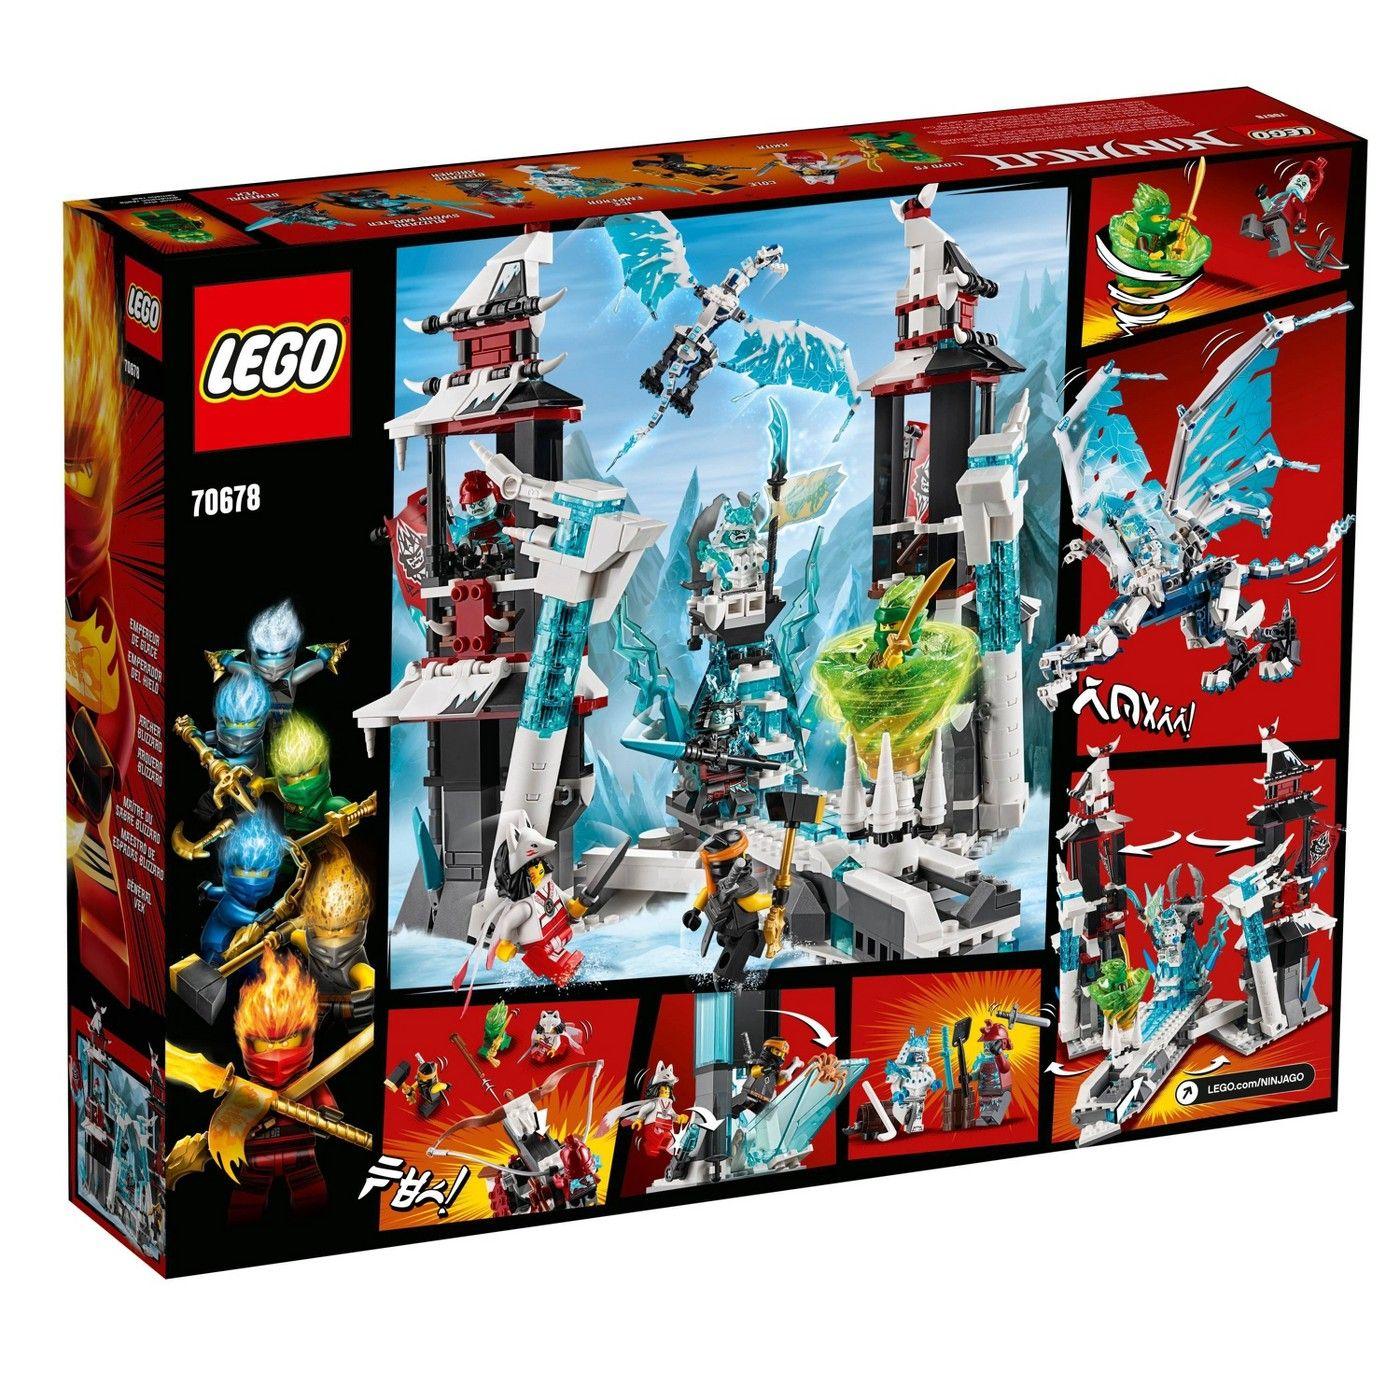 Lego 70675 70674 70673 70676 70677 70678 Ninjago Forbidden Spinjitzu flags